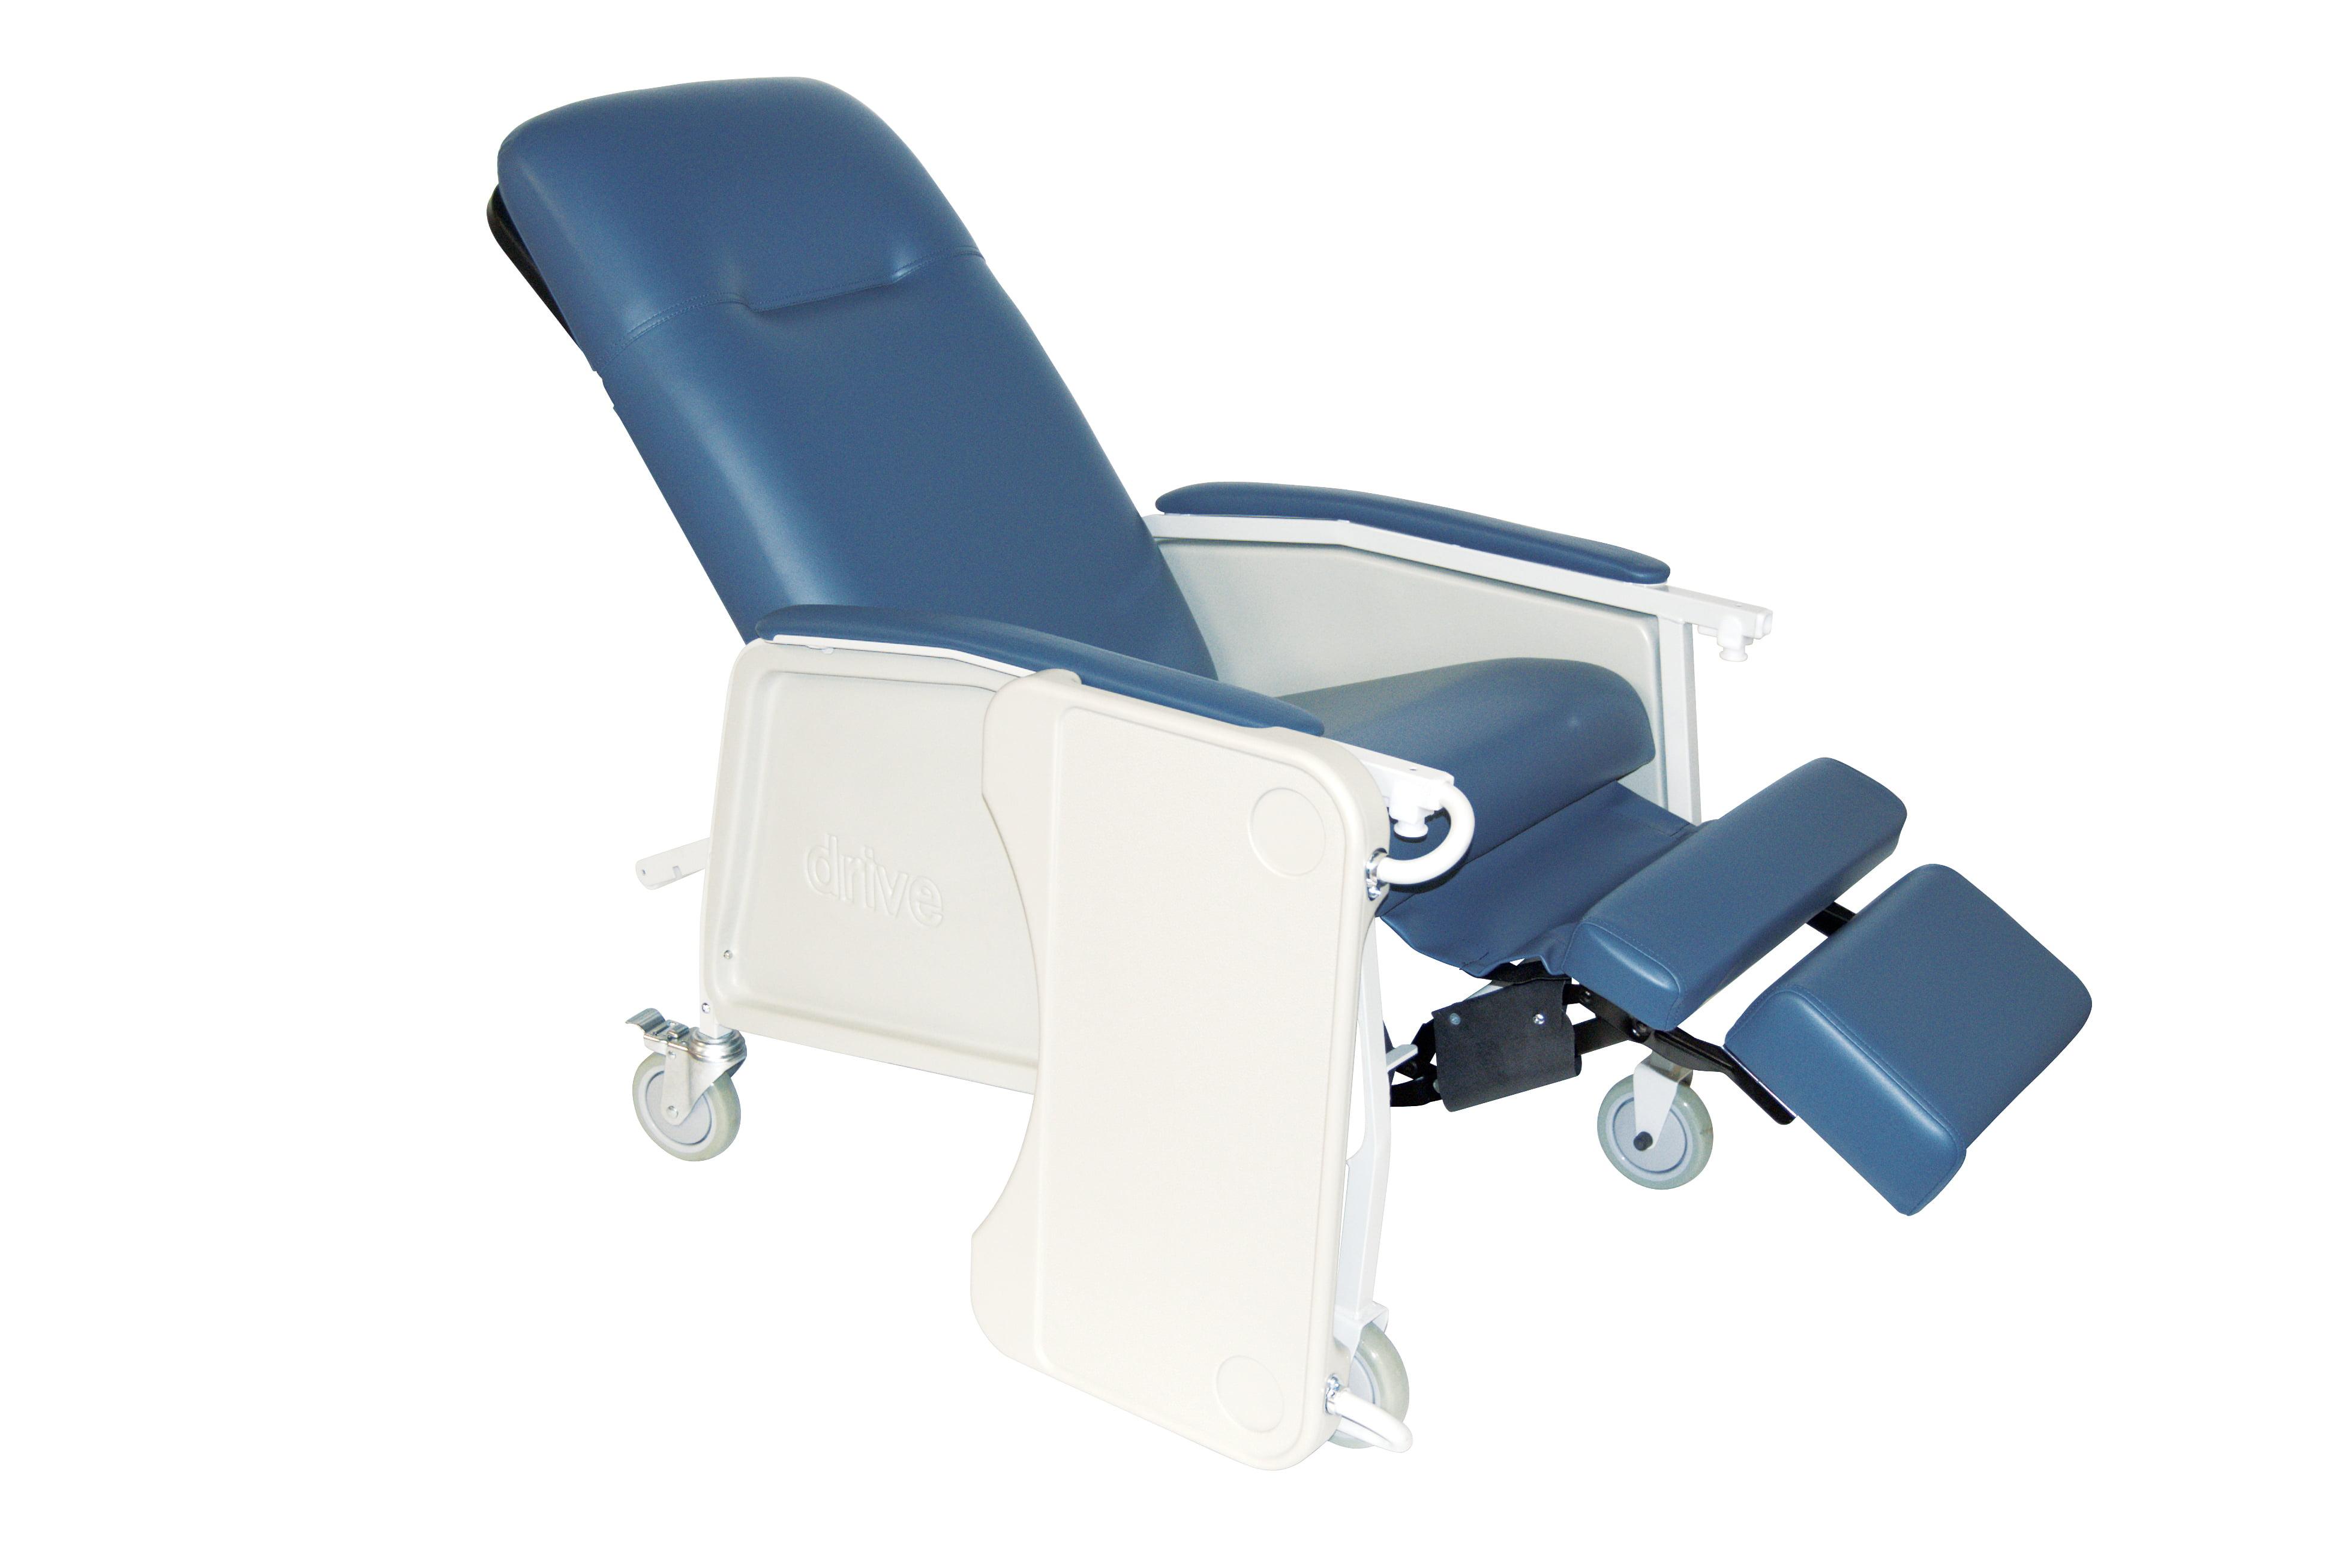 Drive Medical 3 Position Geri Chair Recliner - Walmart.com